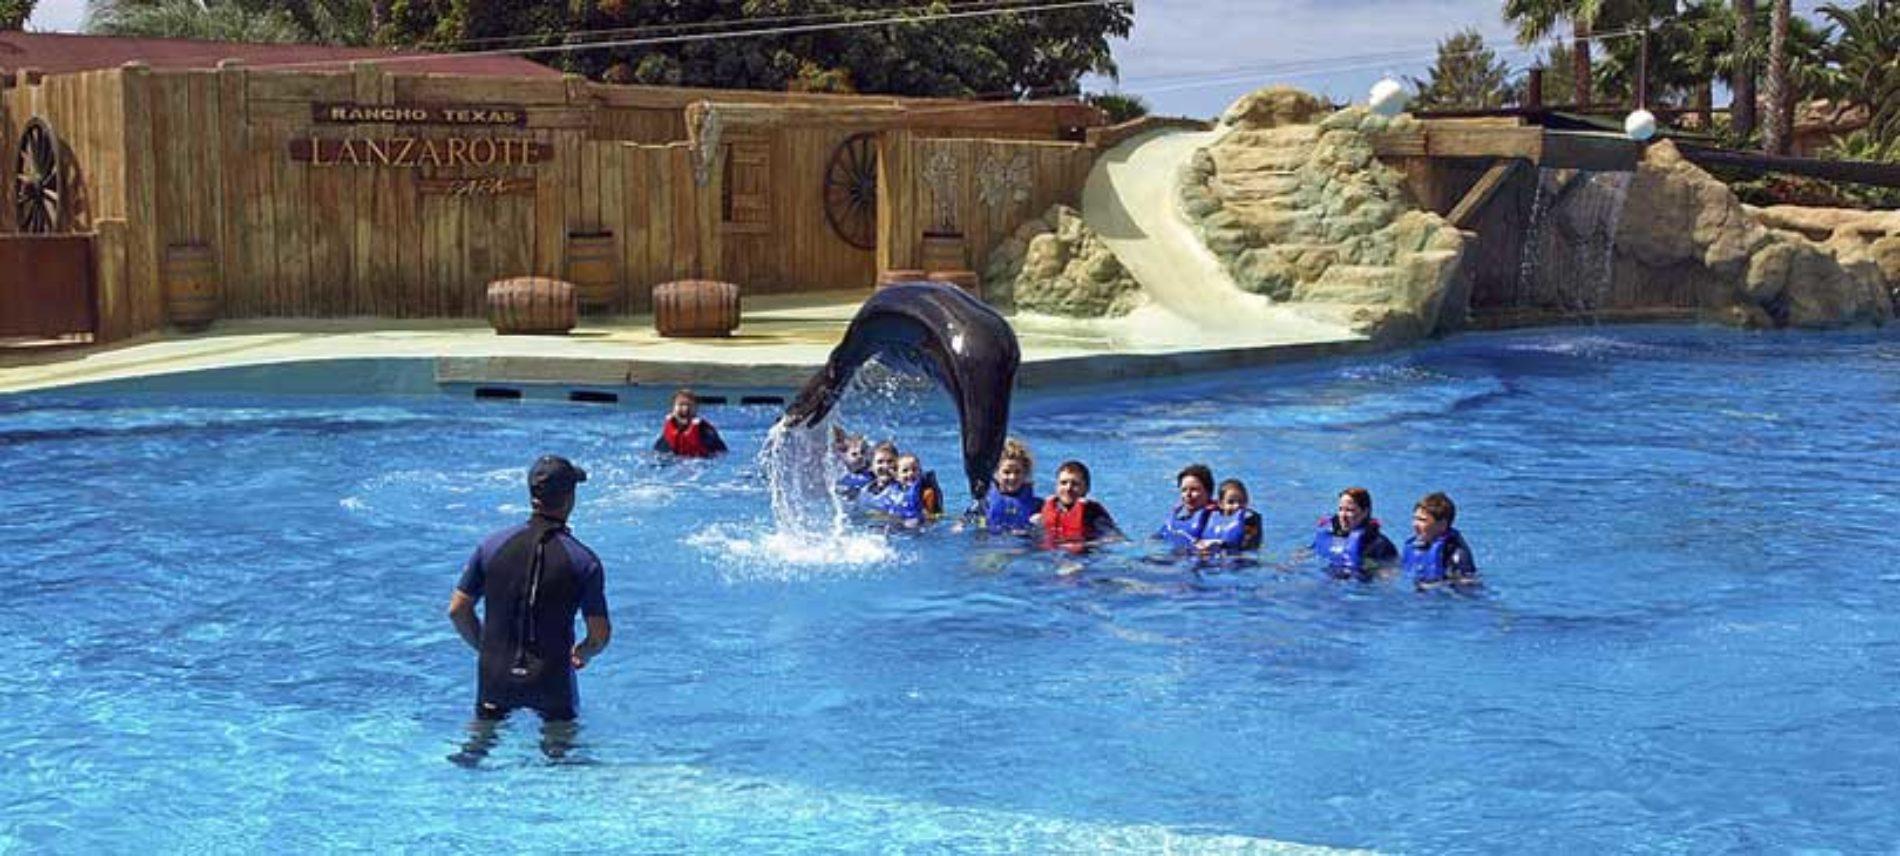 Rancho Texas Lanzarote Park – dyrehage og vannpark!